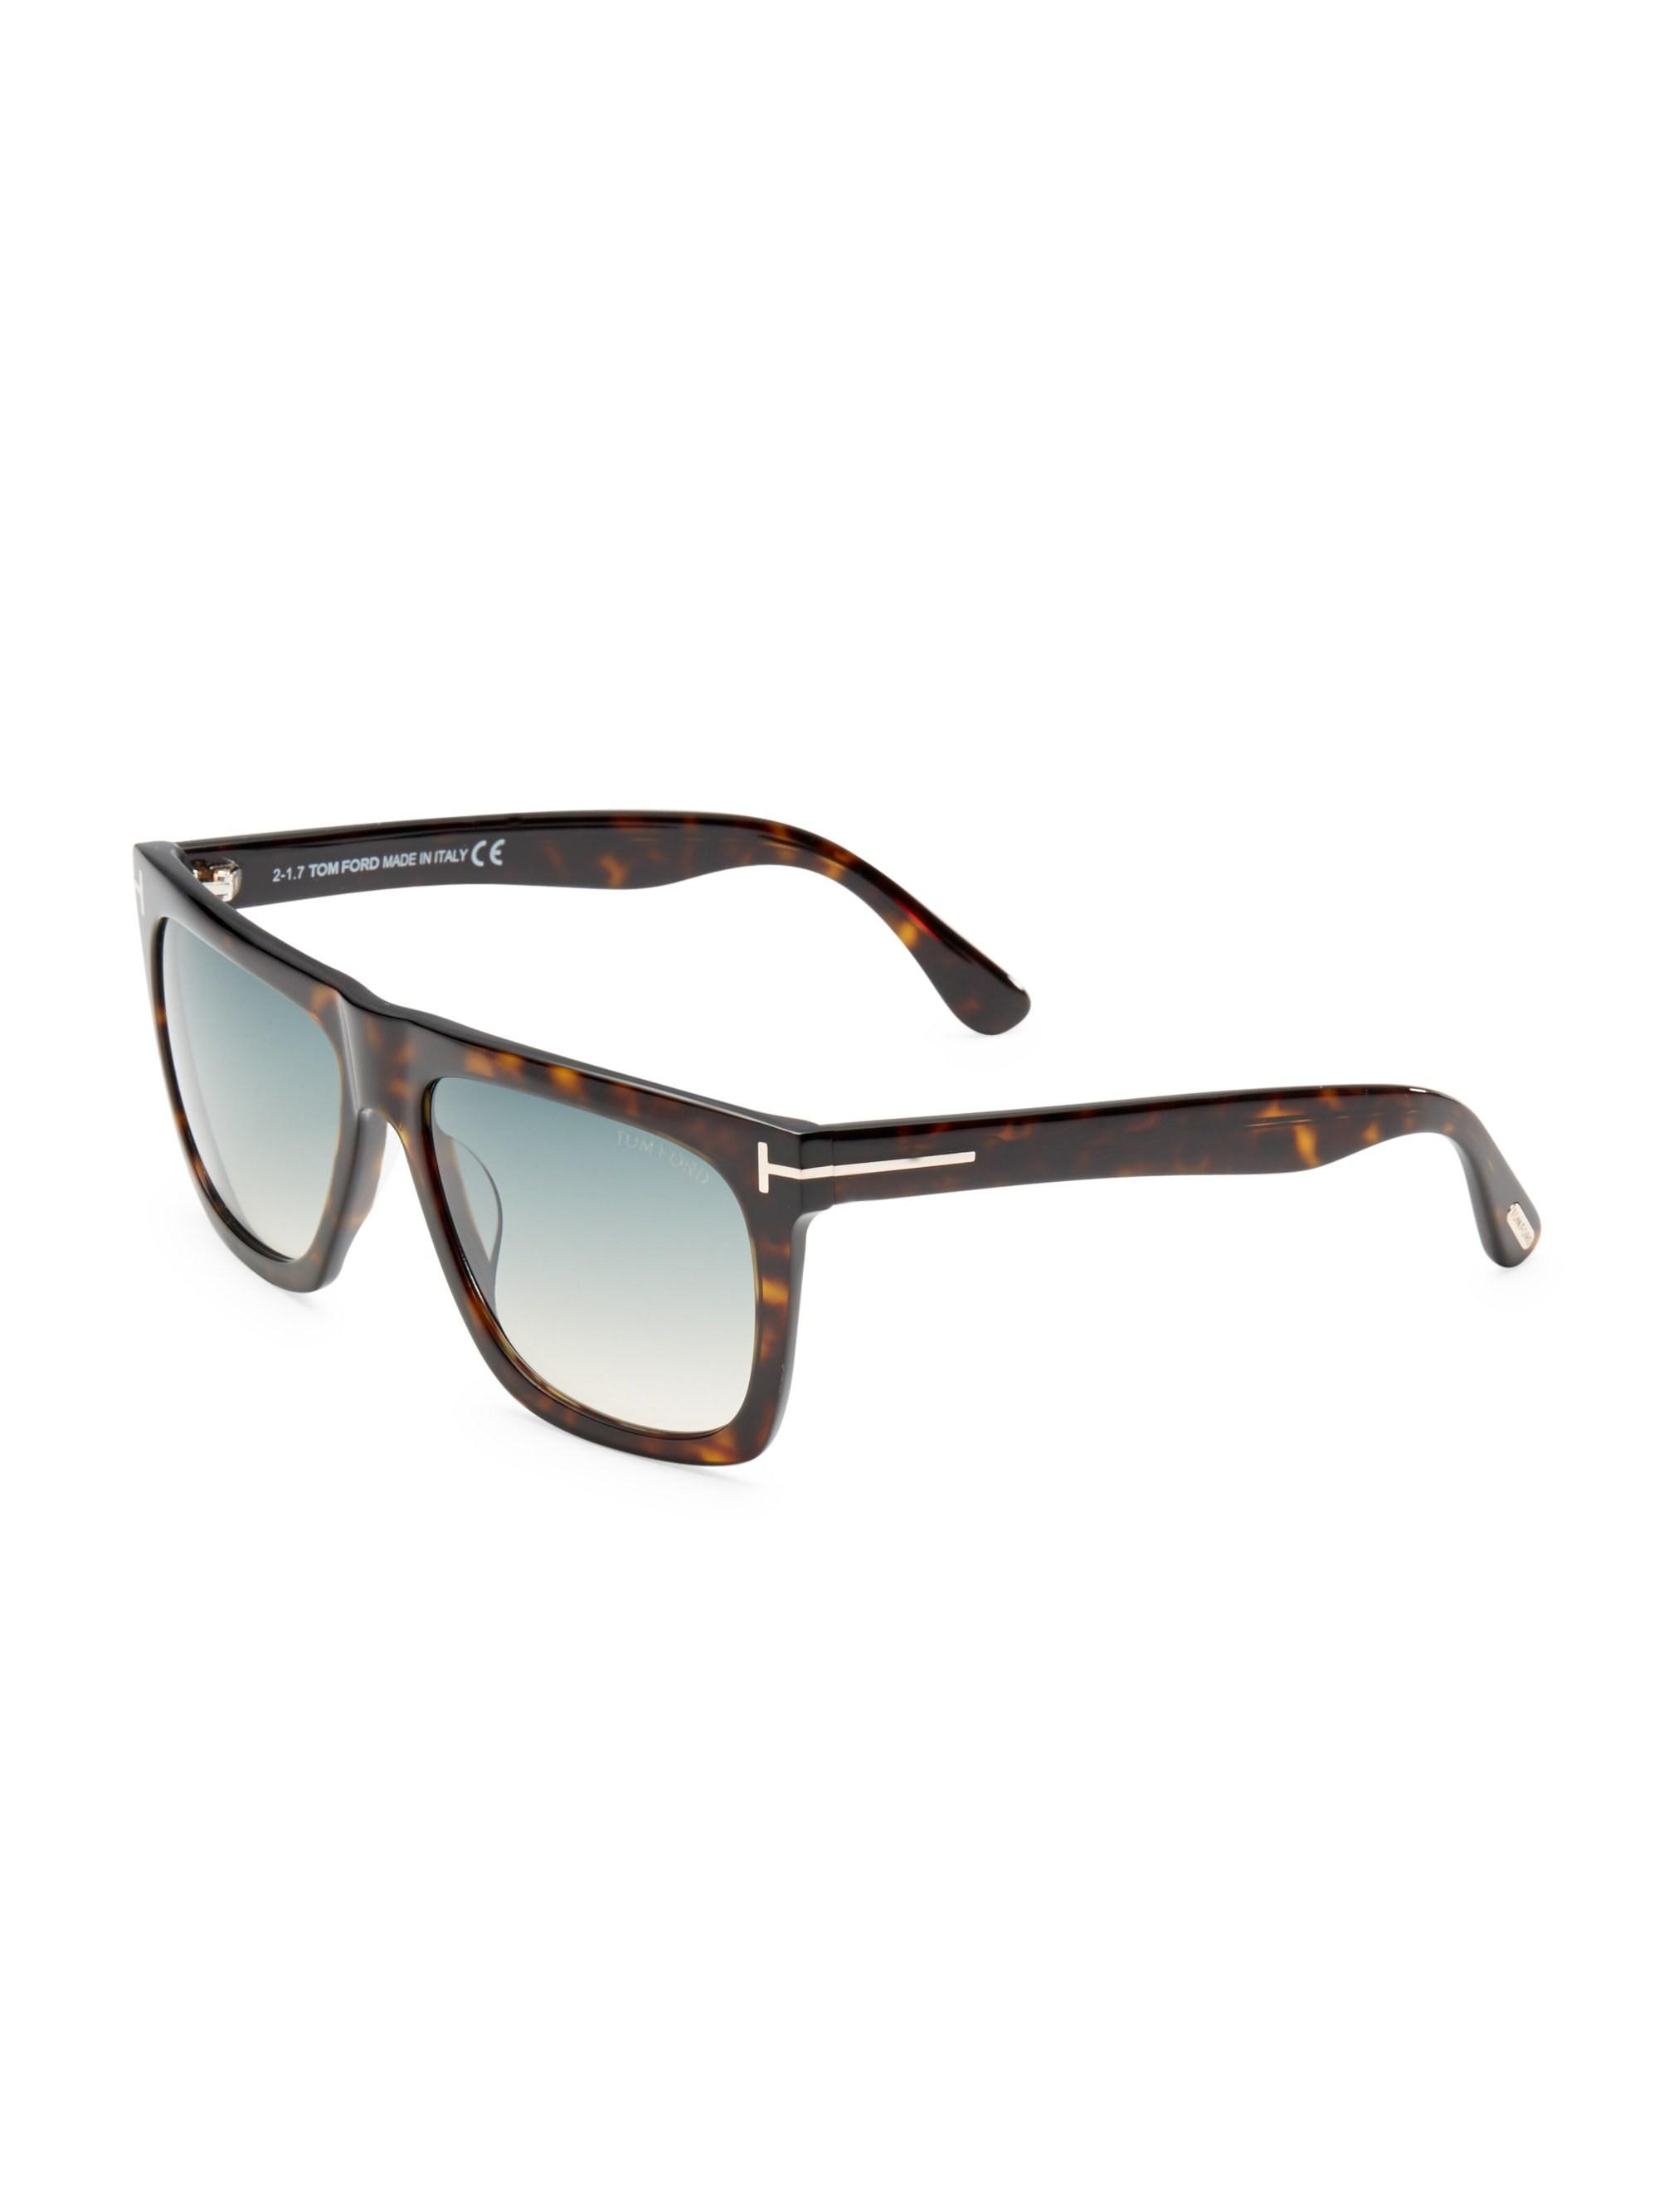 6ca2647ba7 Lyst - Tom Ford Morgan 57mm Soft Square Sunglasses for Men